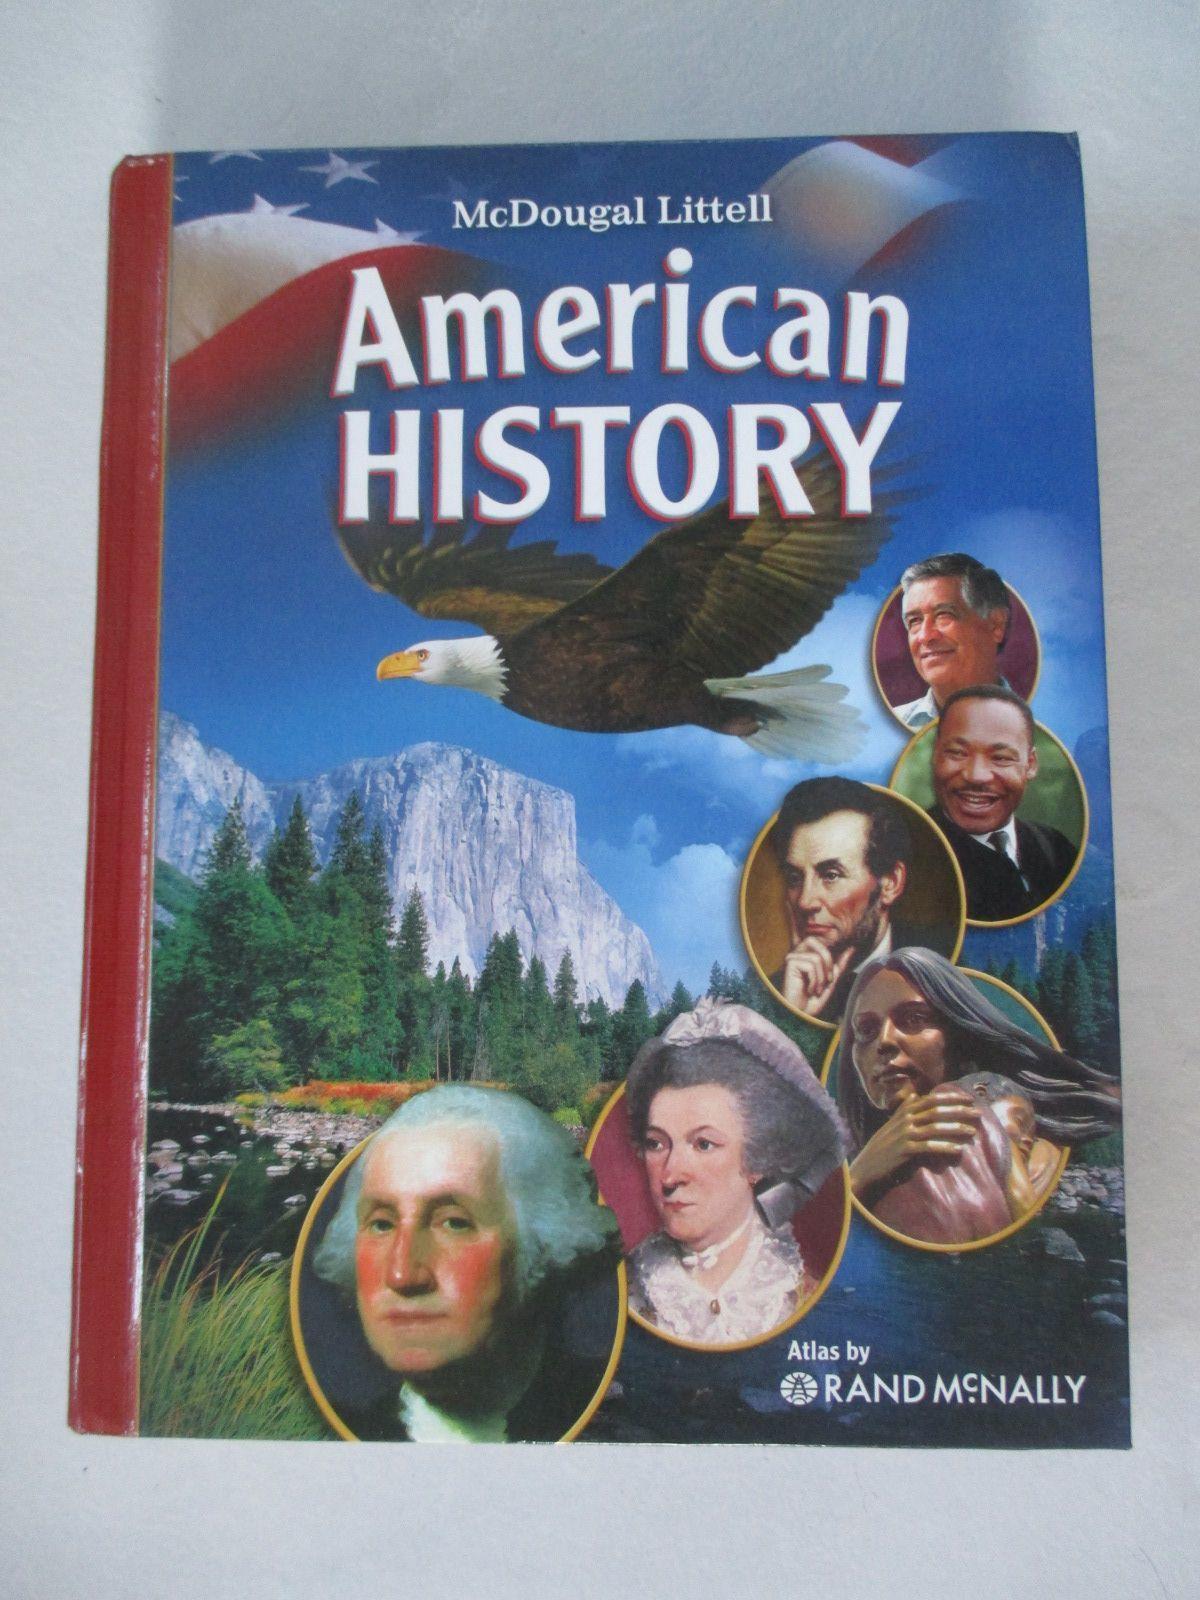 9780618556717 - American history by MCDOUGAL LITTEL